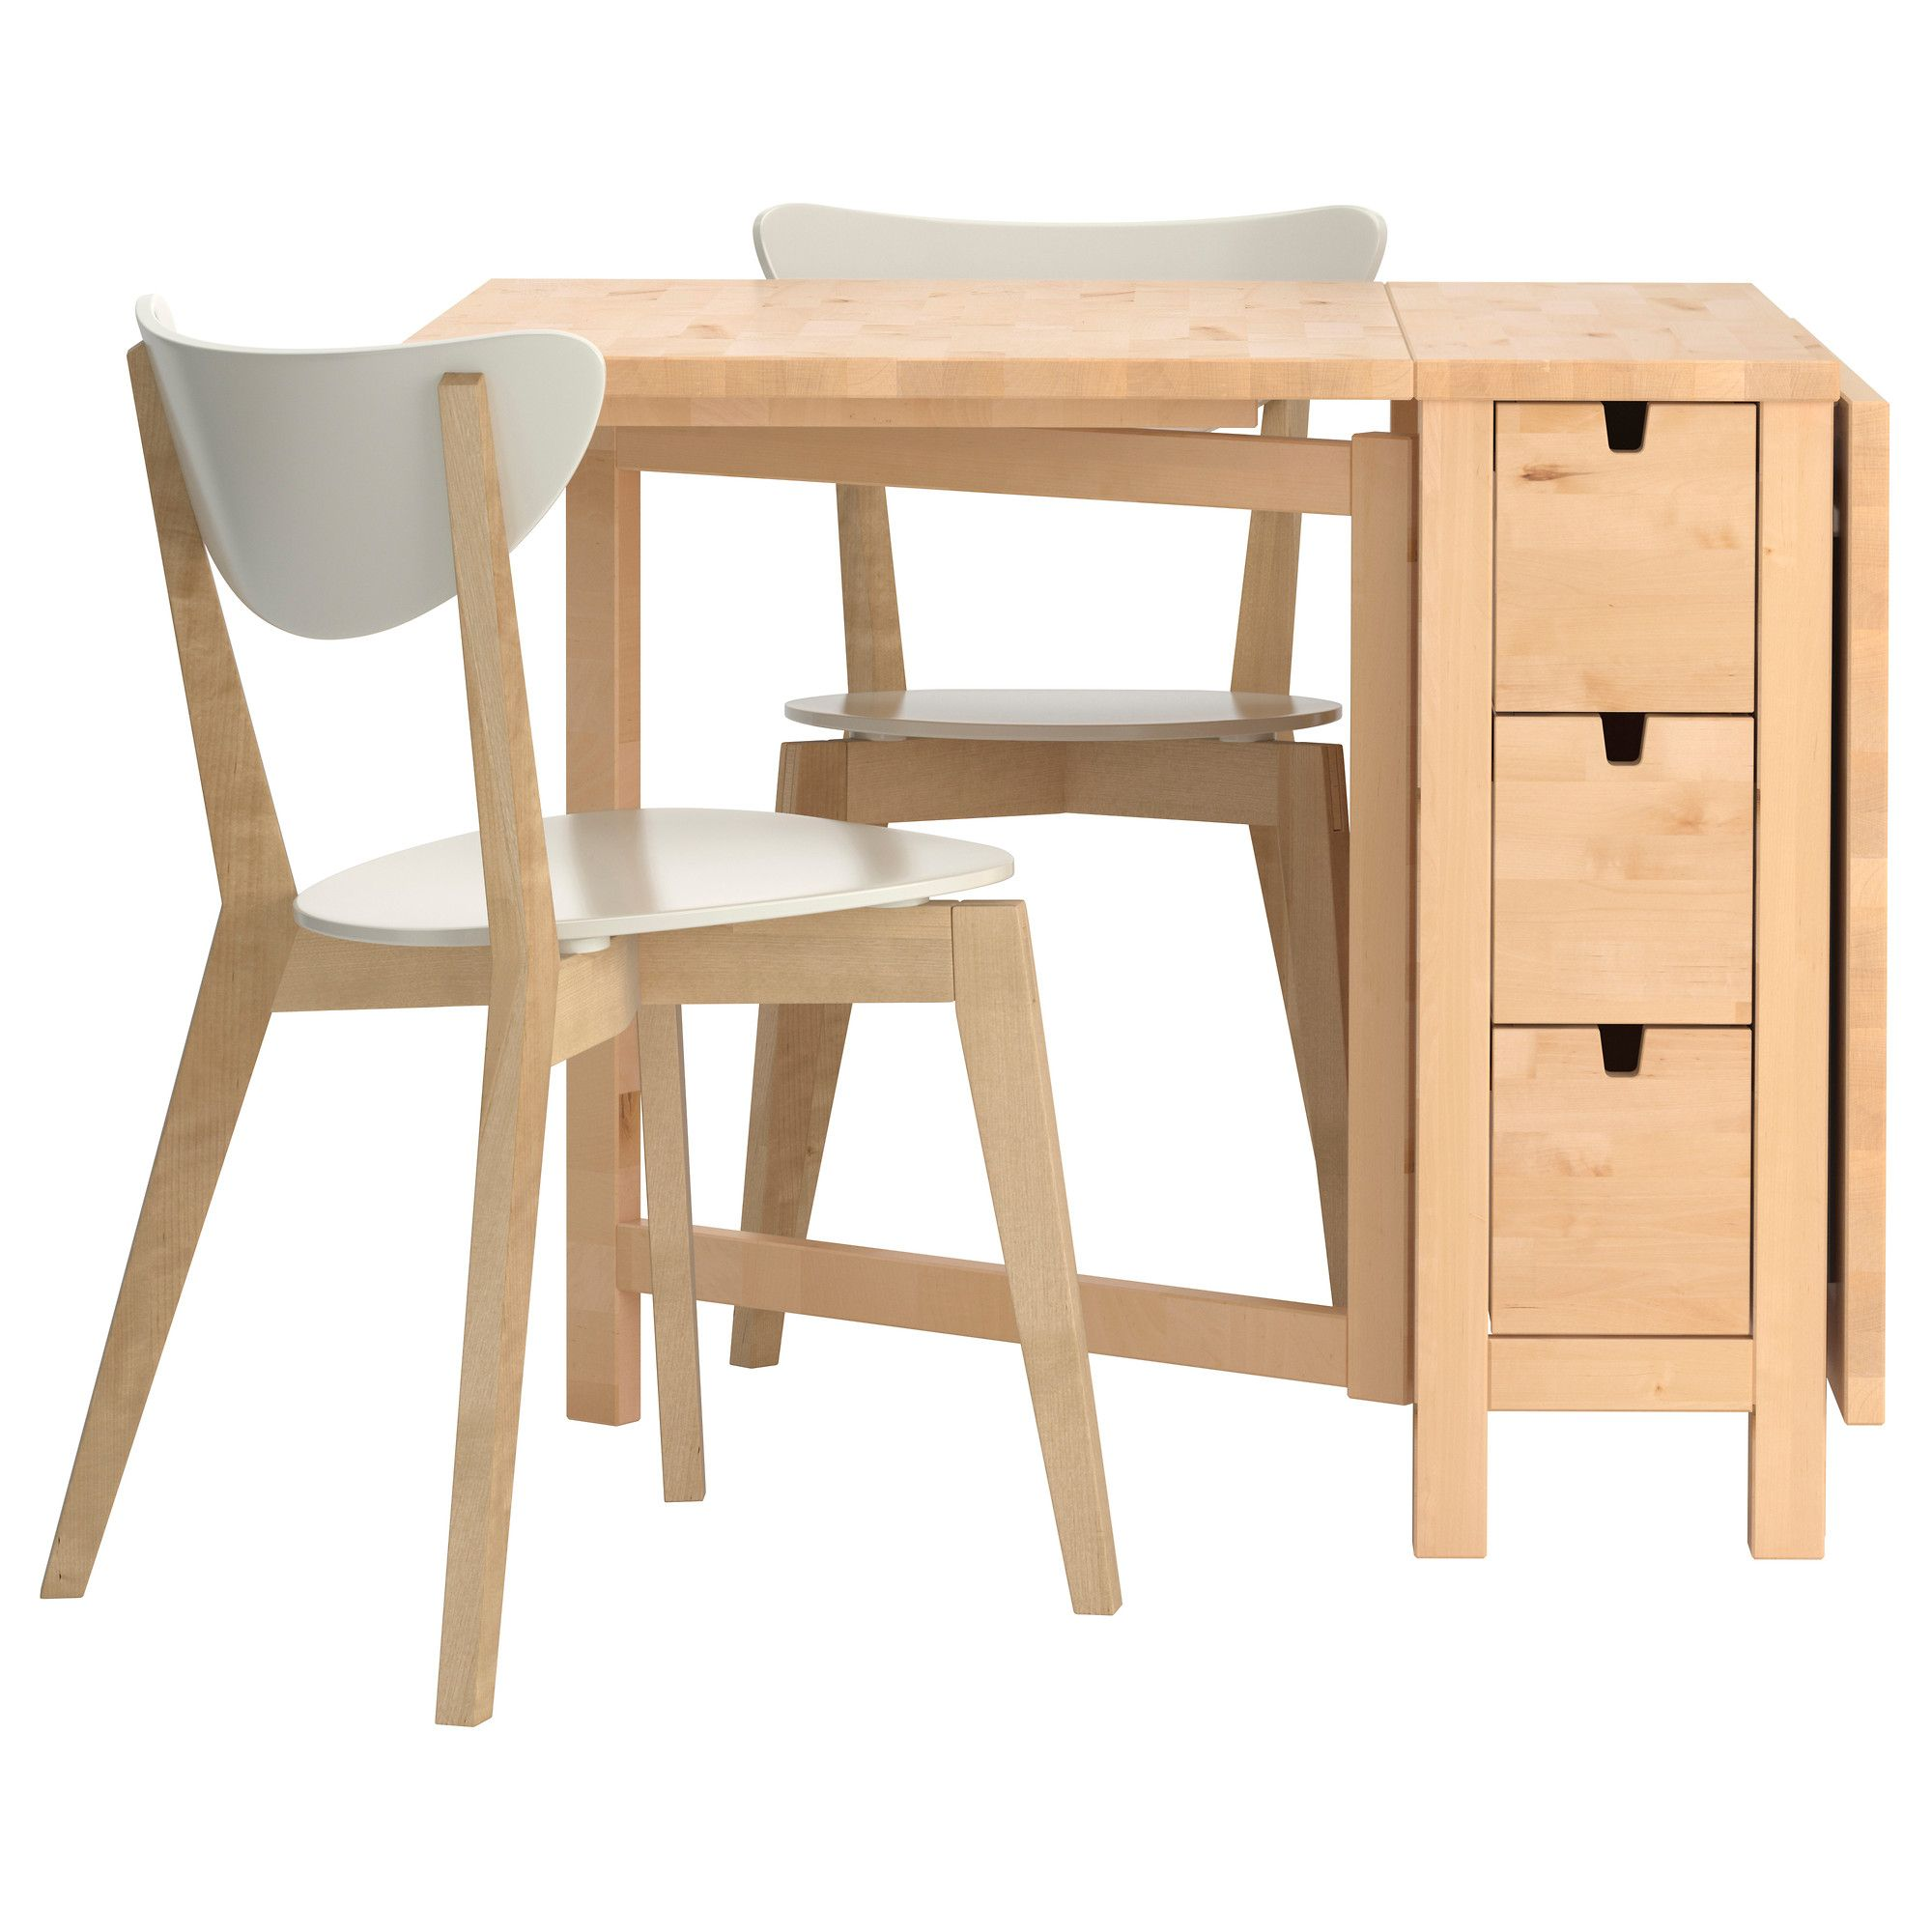 Ikea Us Furniture And Home Furnishings Ikea Norden Table Ikea Furniture